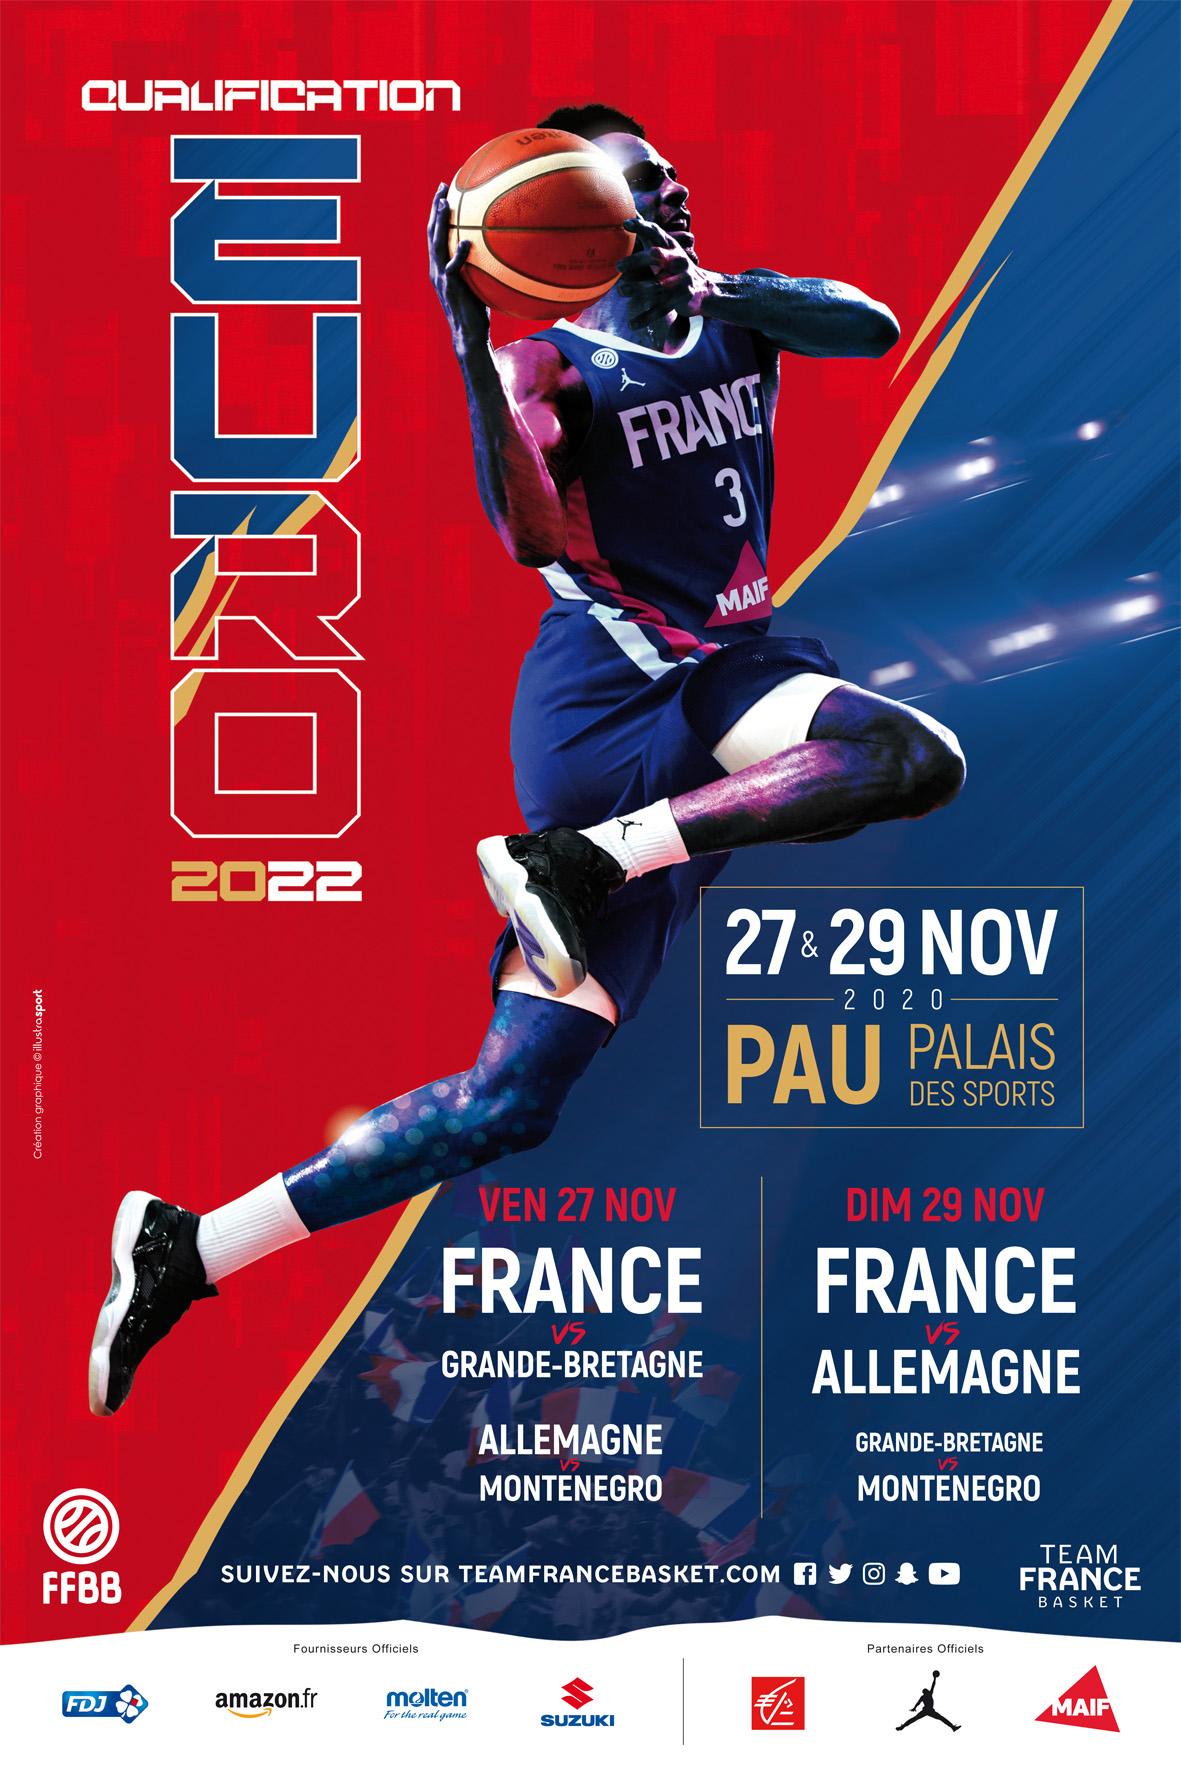 Calendrier General Ffbb 2021 2022 La France organisera 4 matches à Pau en novembre | FFBB